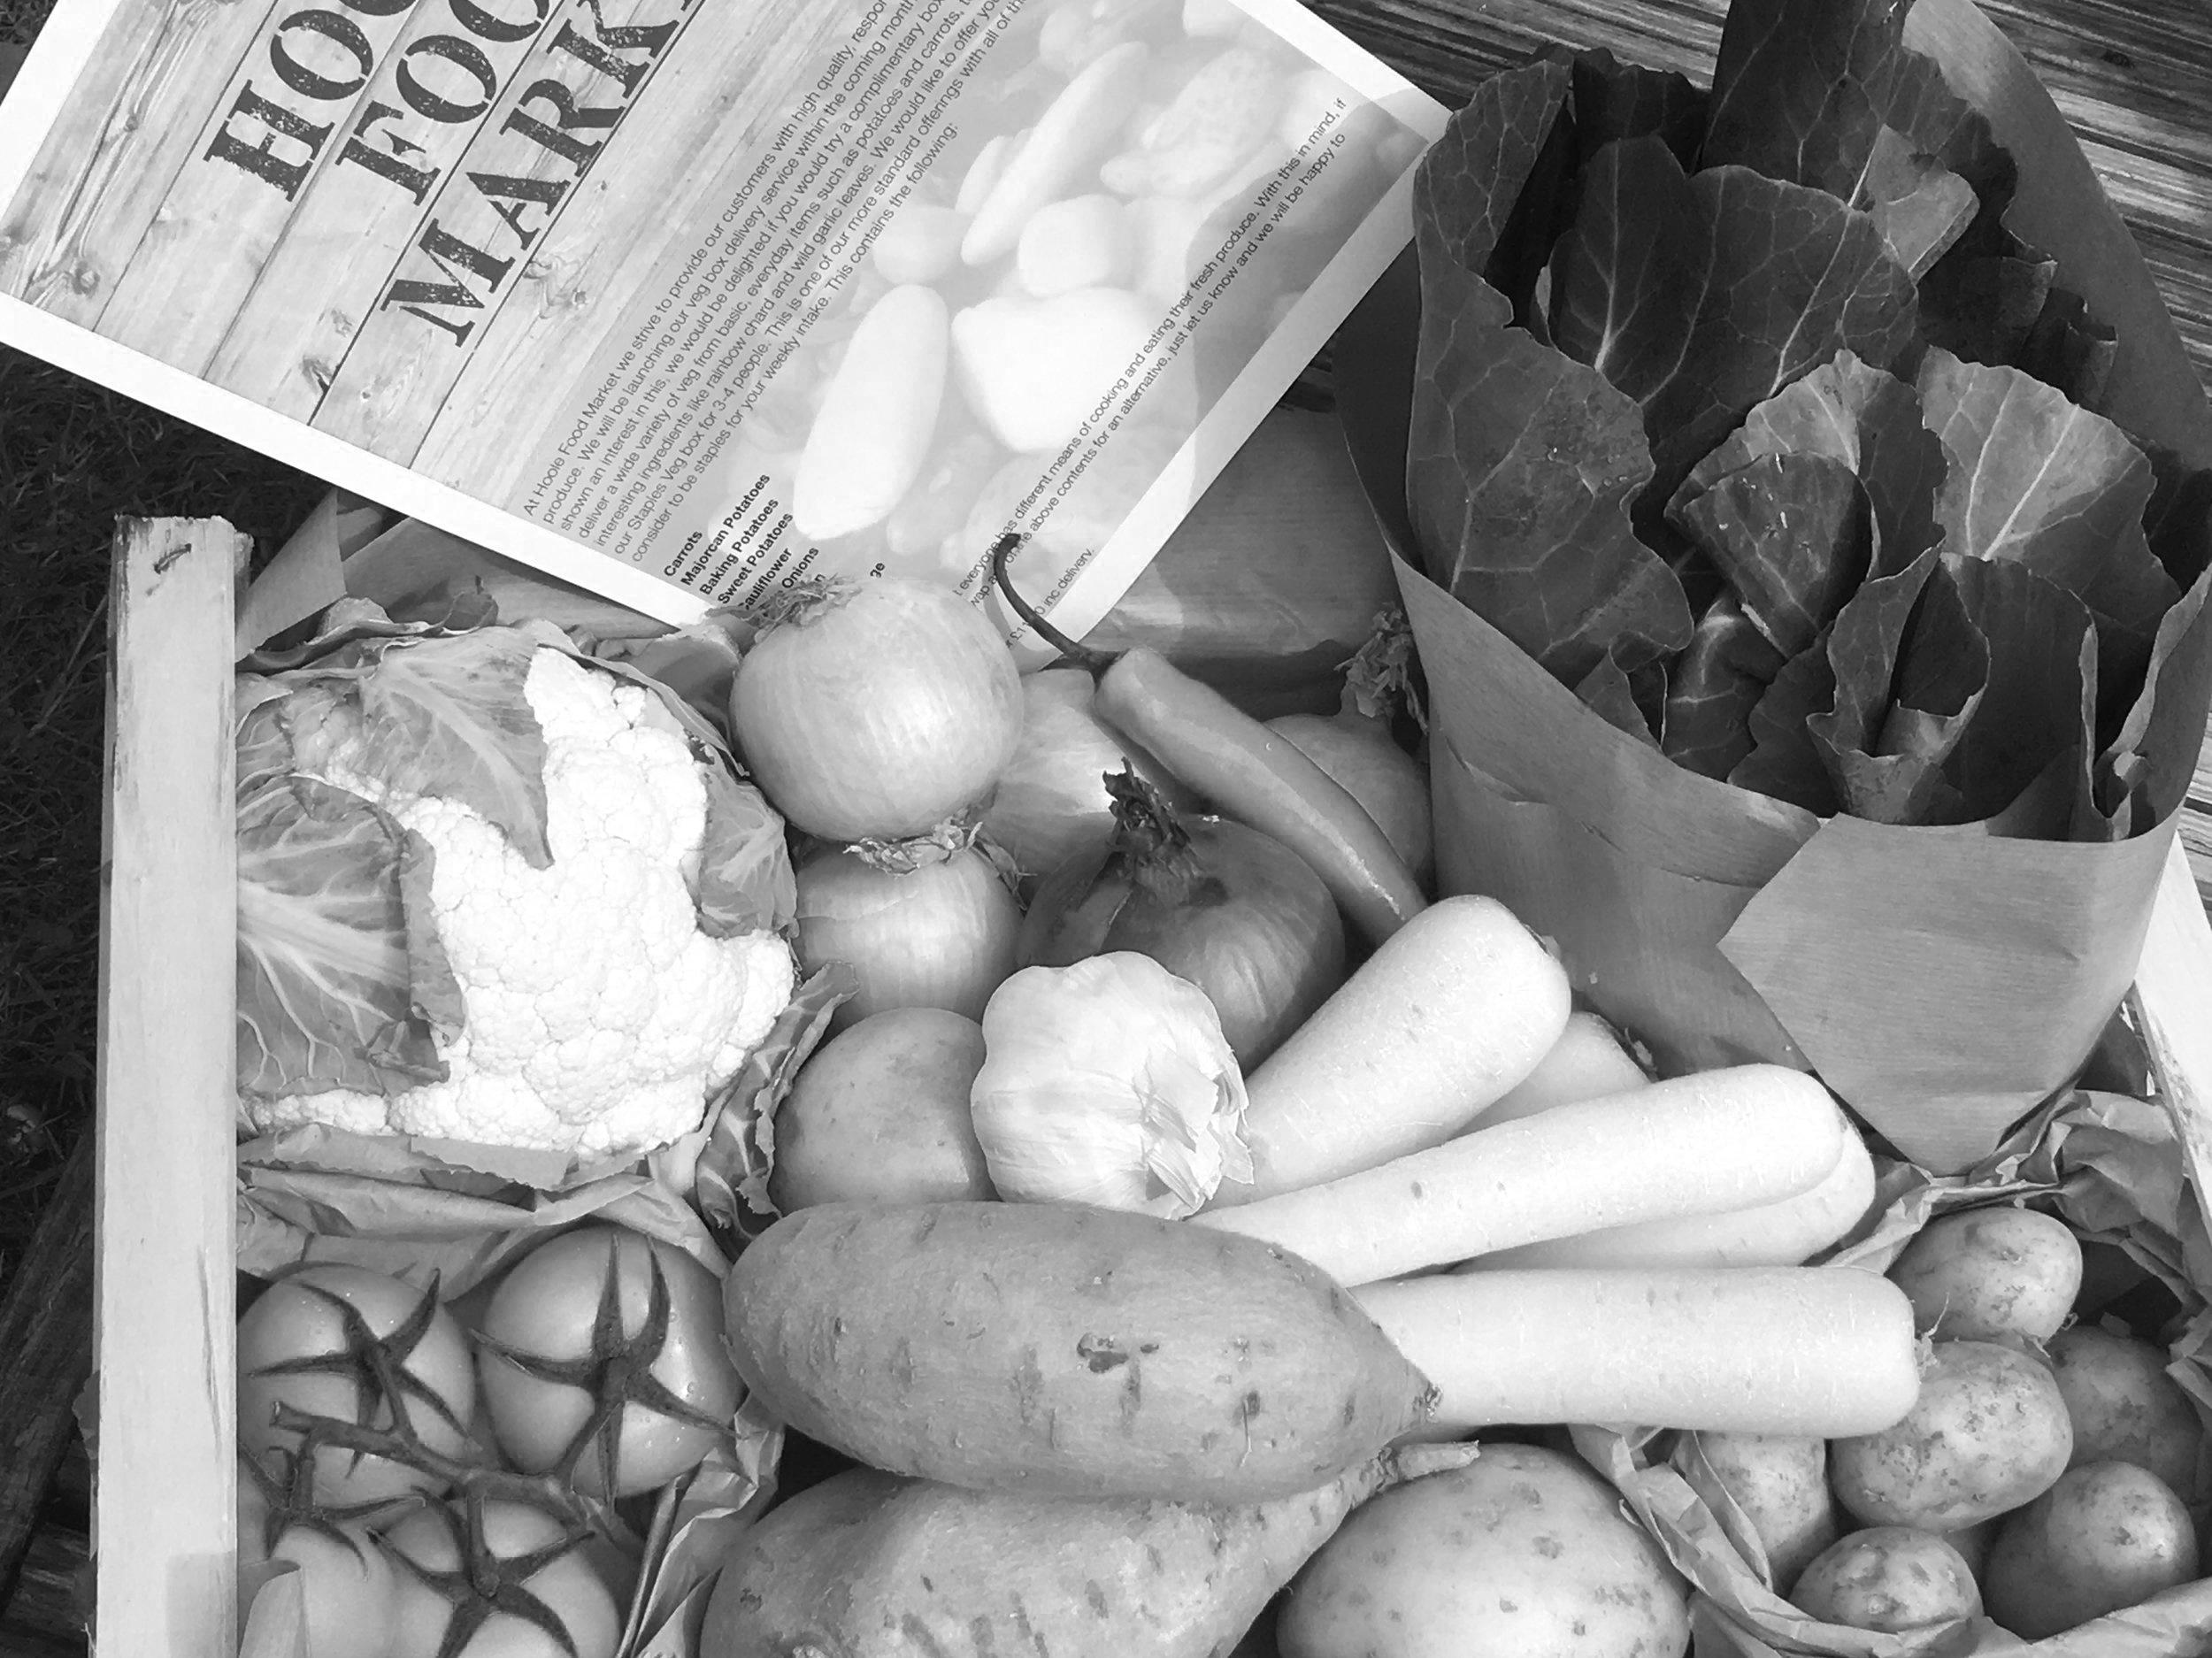 Veg Boxes - at Hoole Food Market